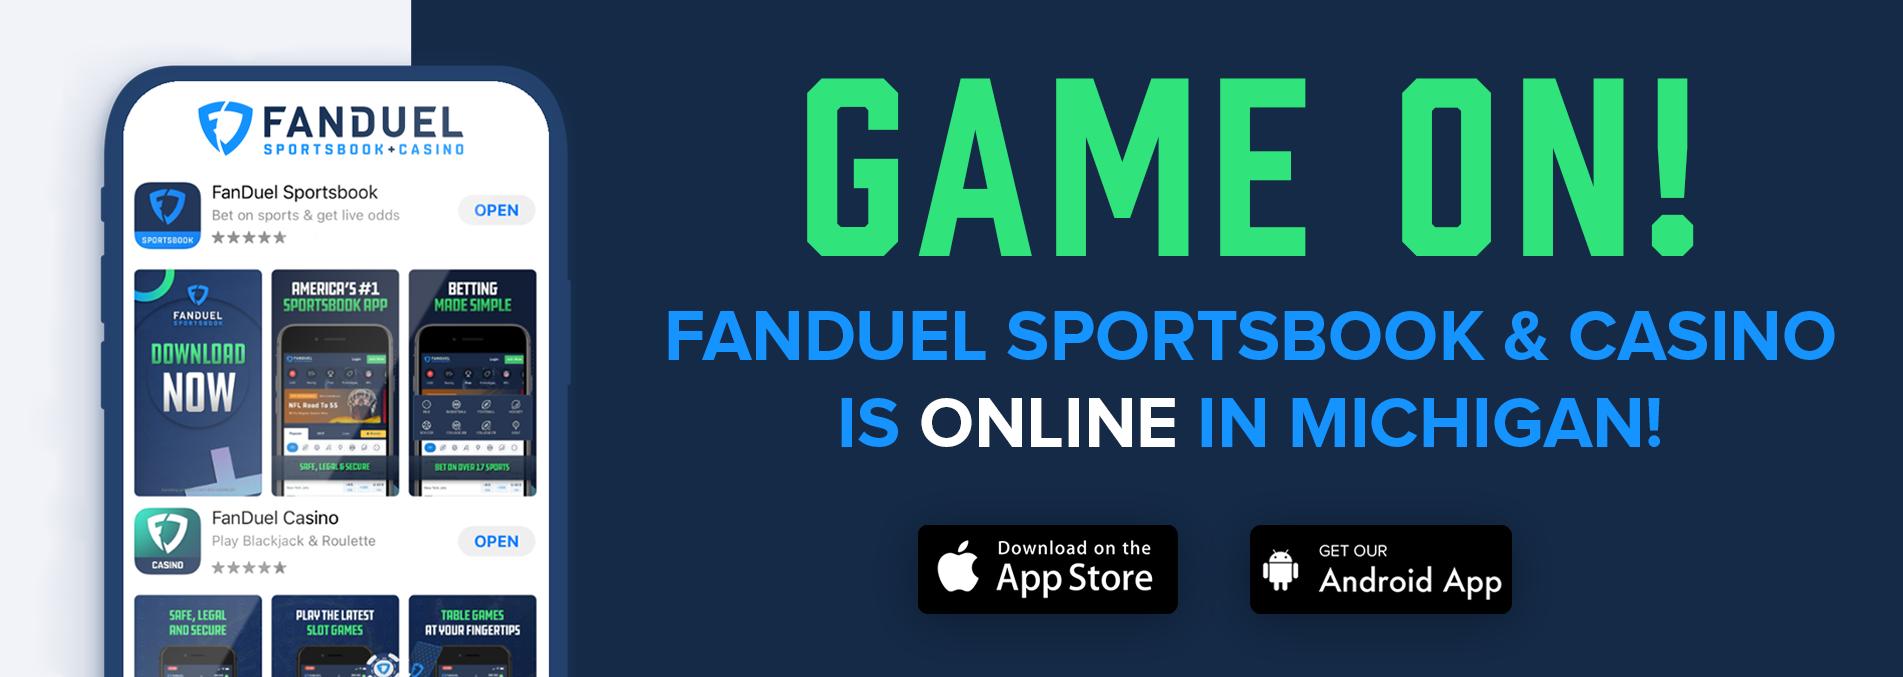 Casino Action Mobile App